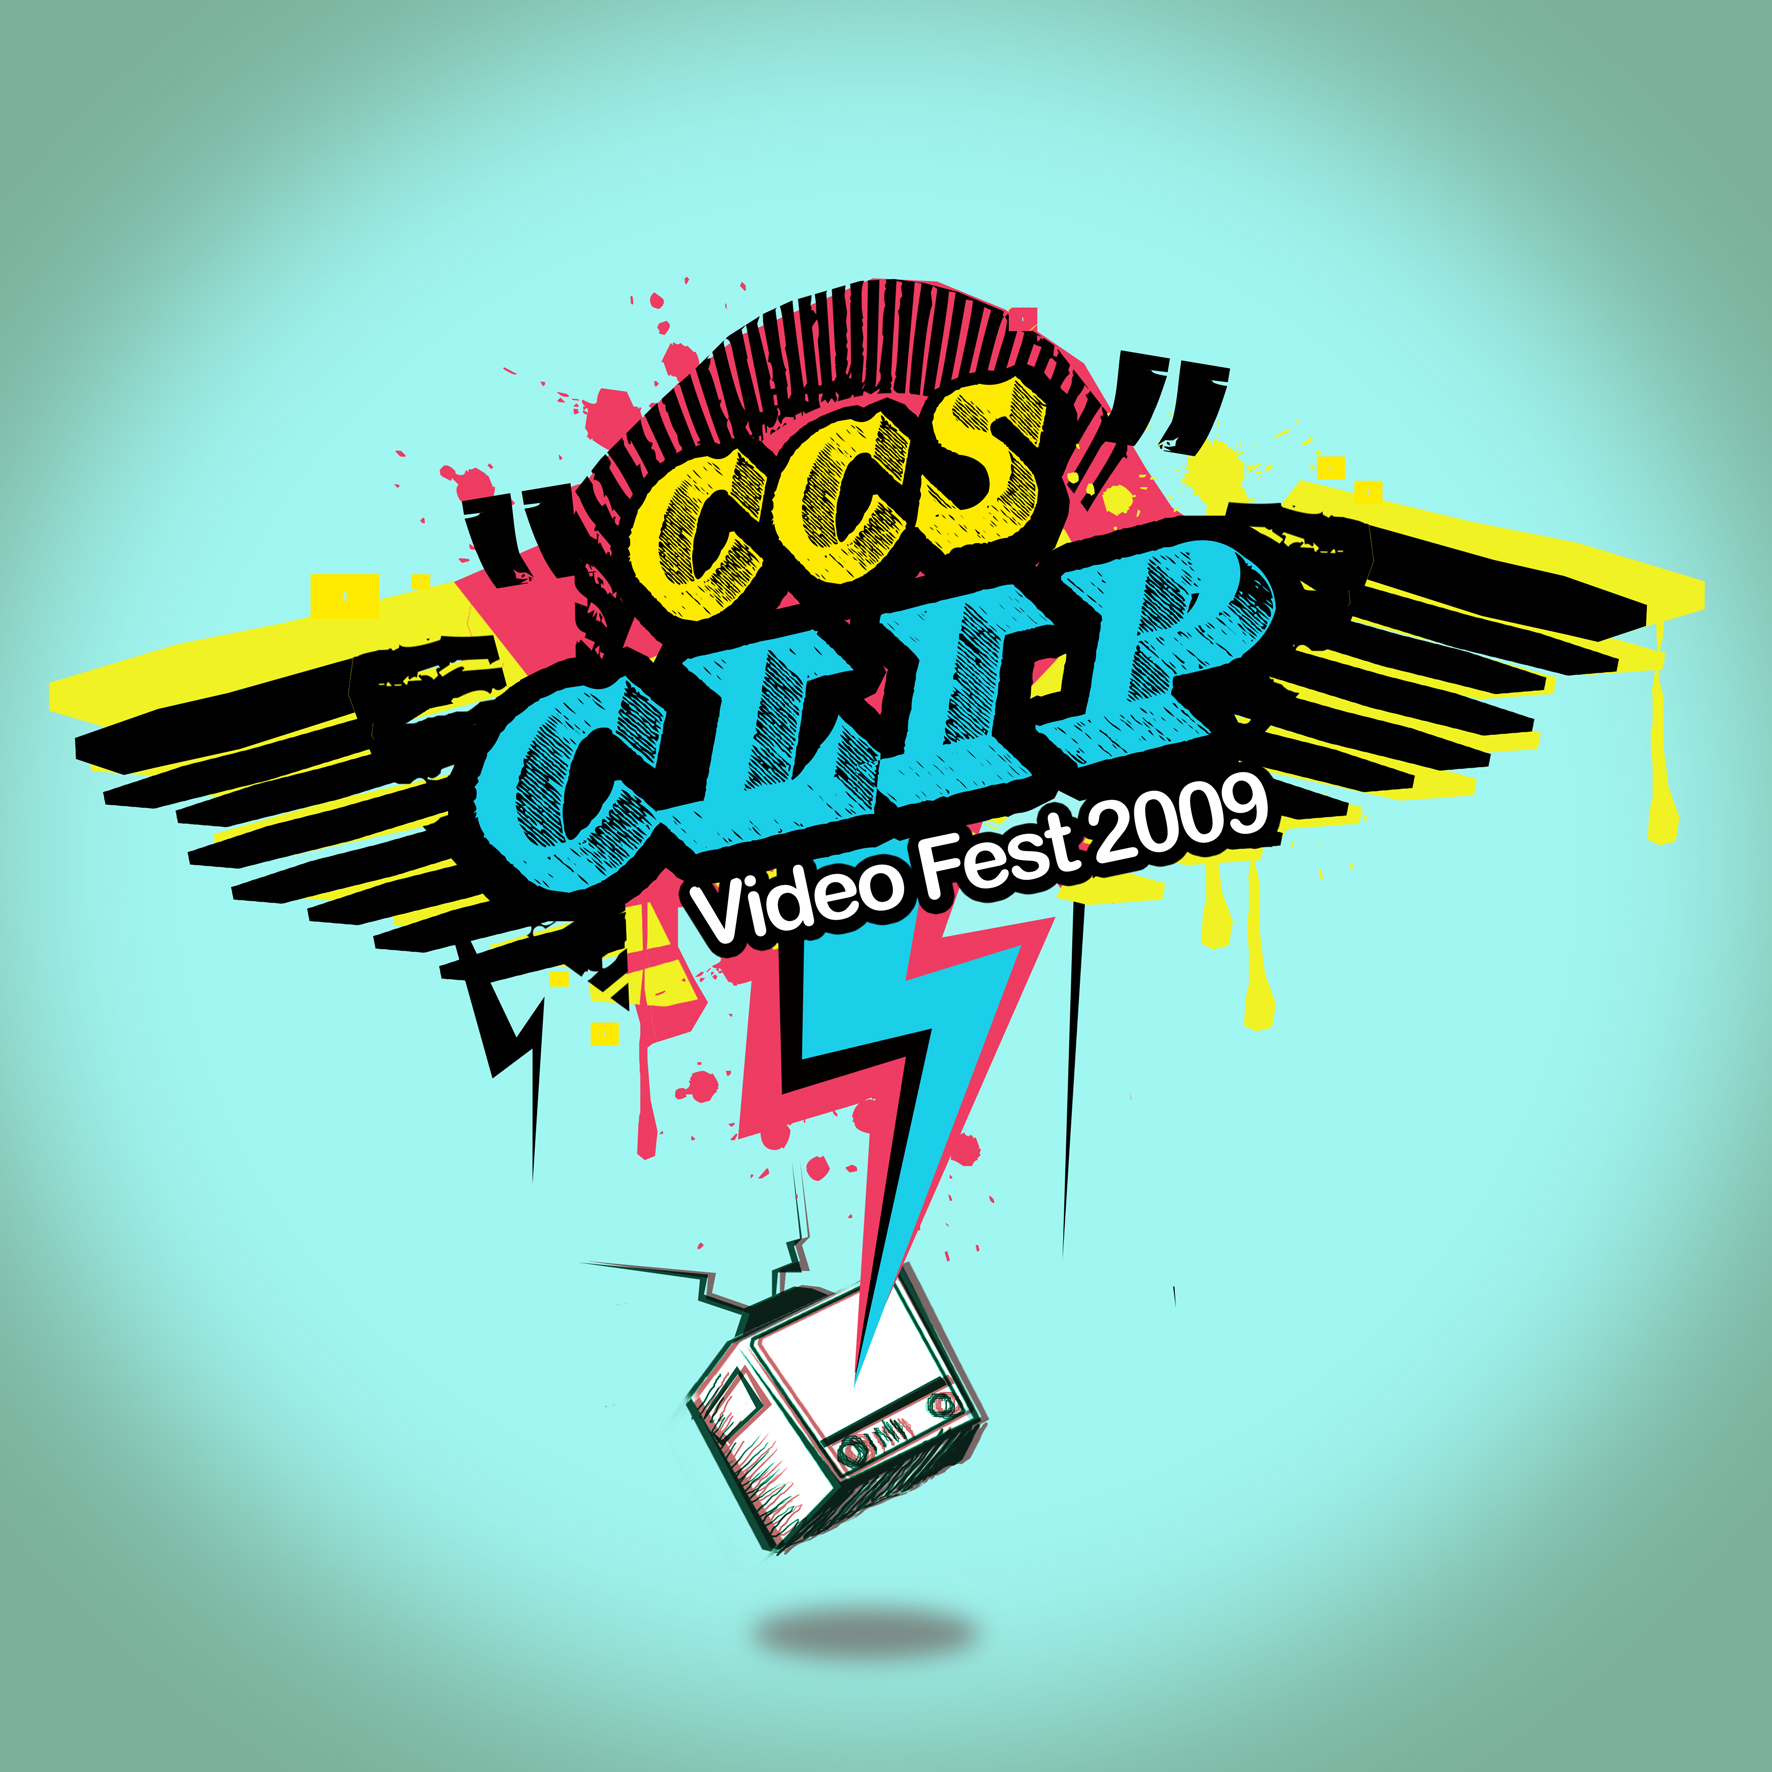 logo3-1-1.jpg